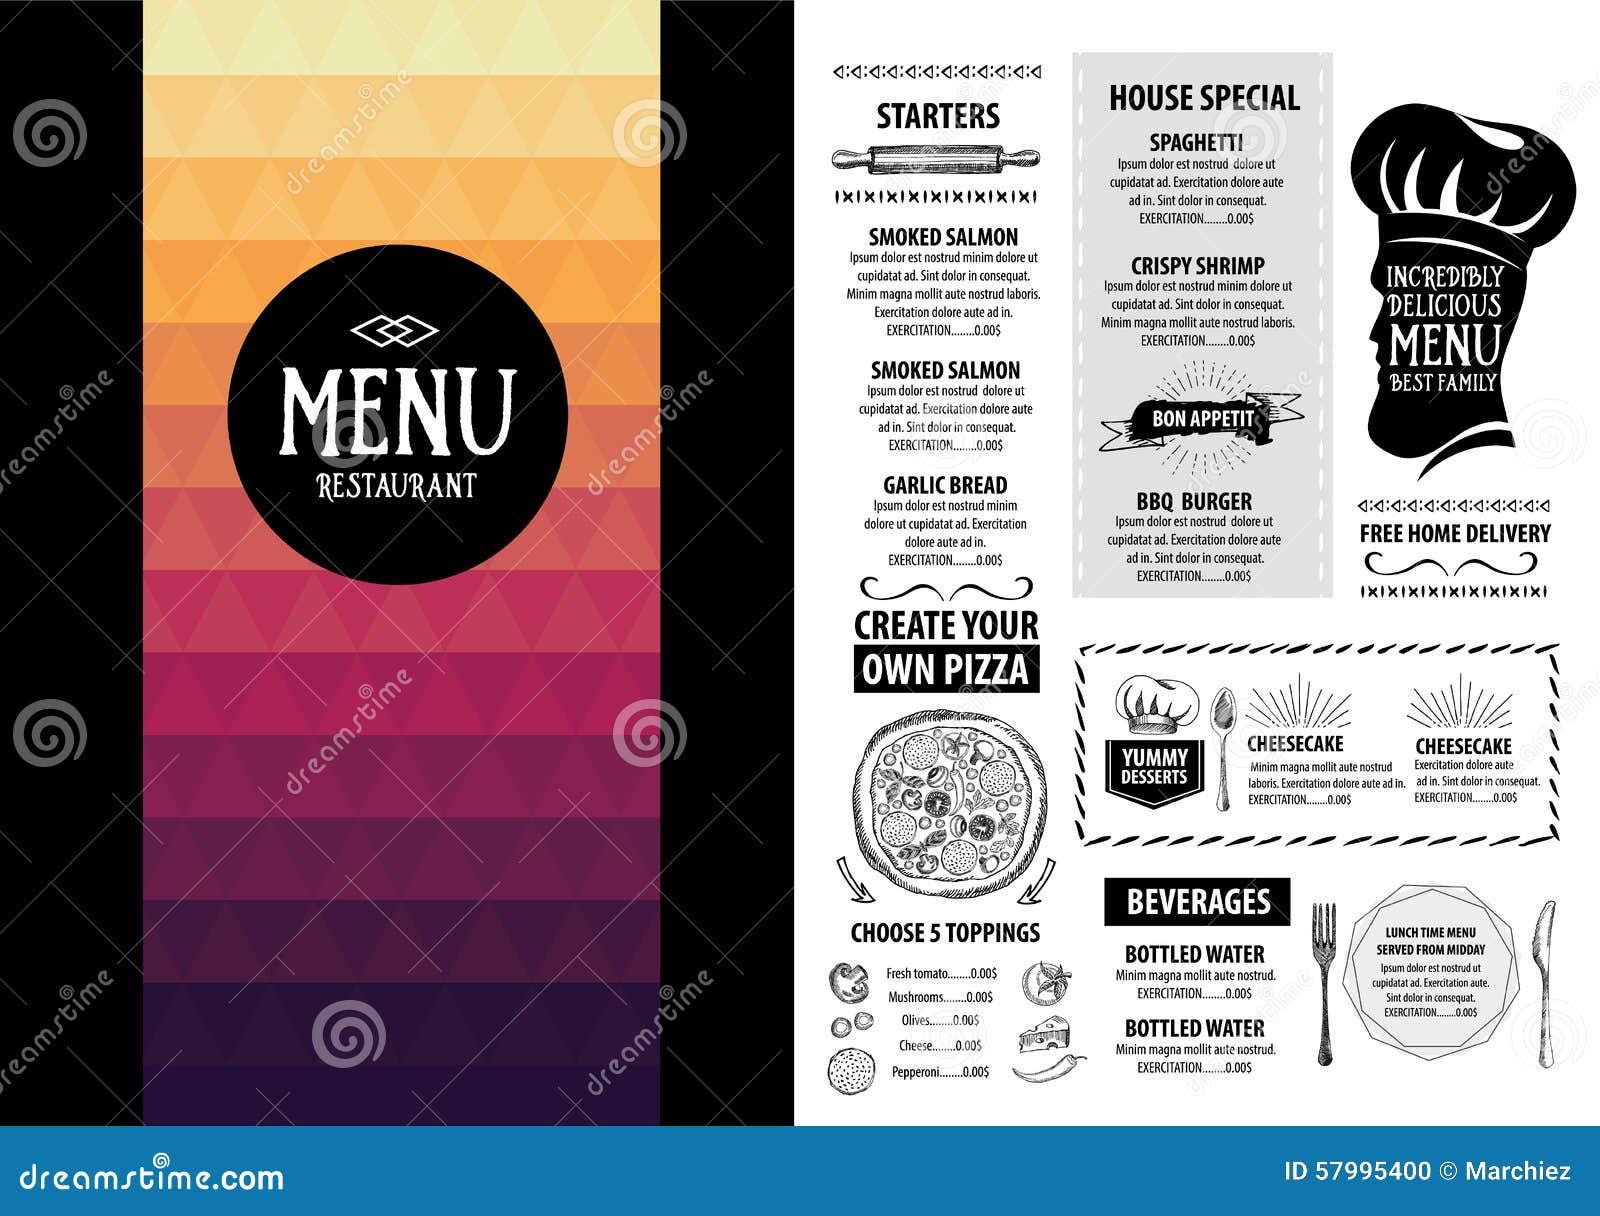 Restaurant Cafe Menu Template Design Vector Image 67469378 – Cafe Menu Template